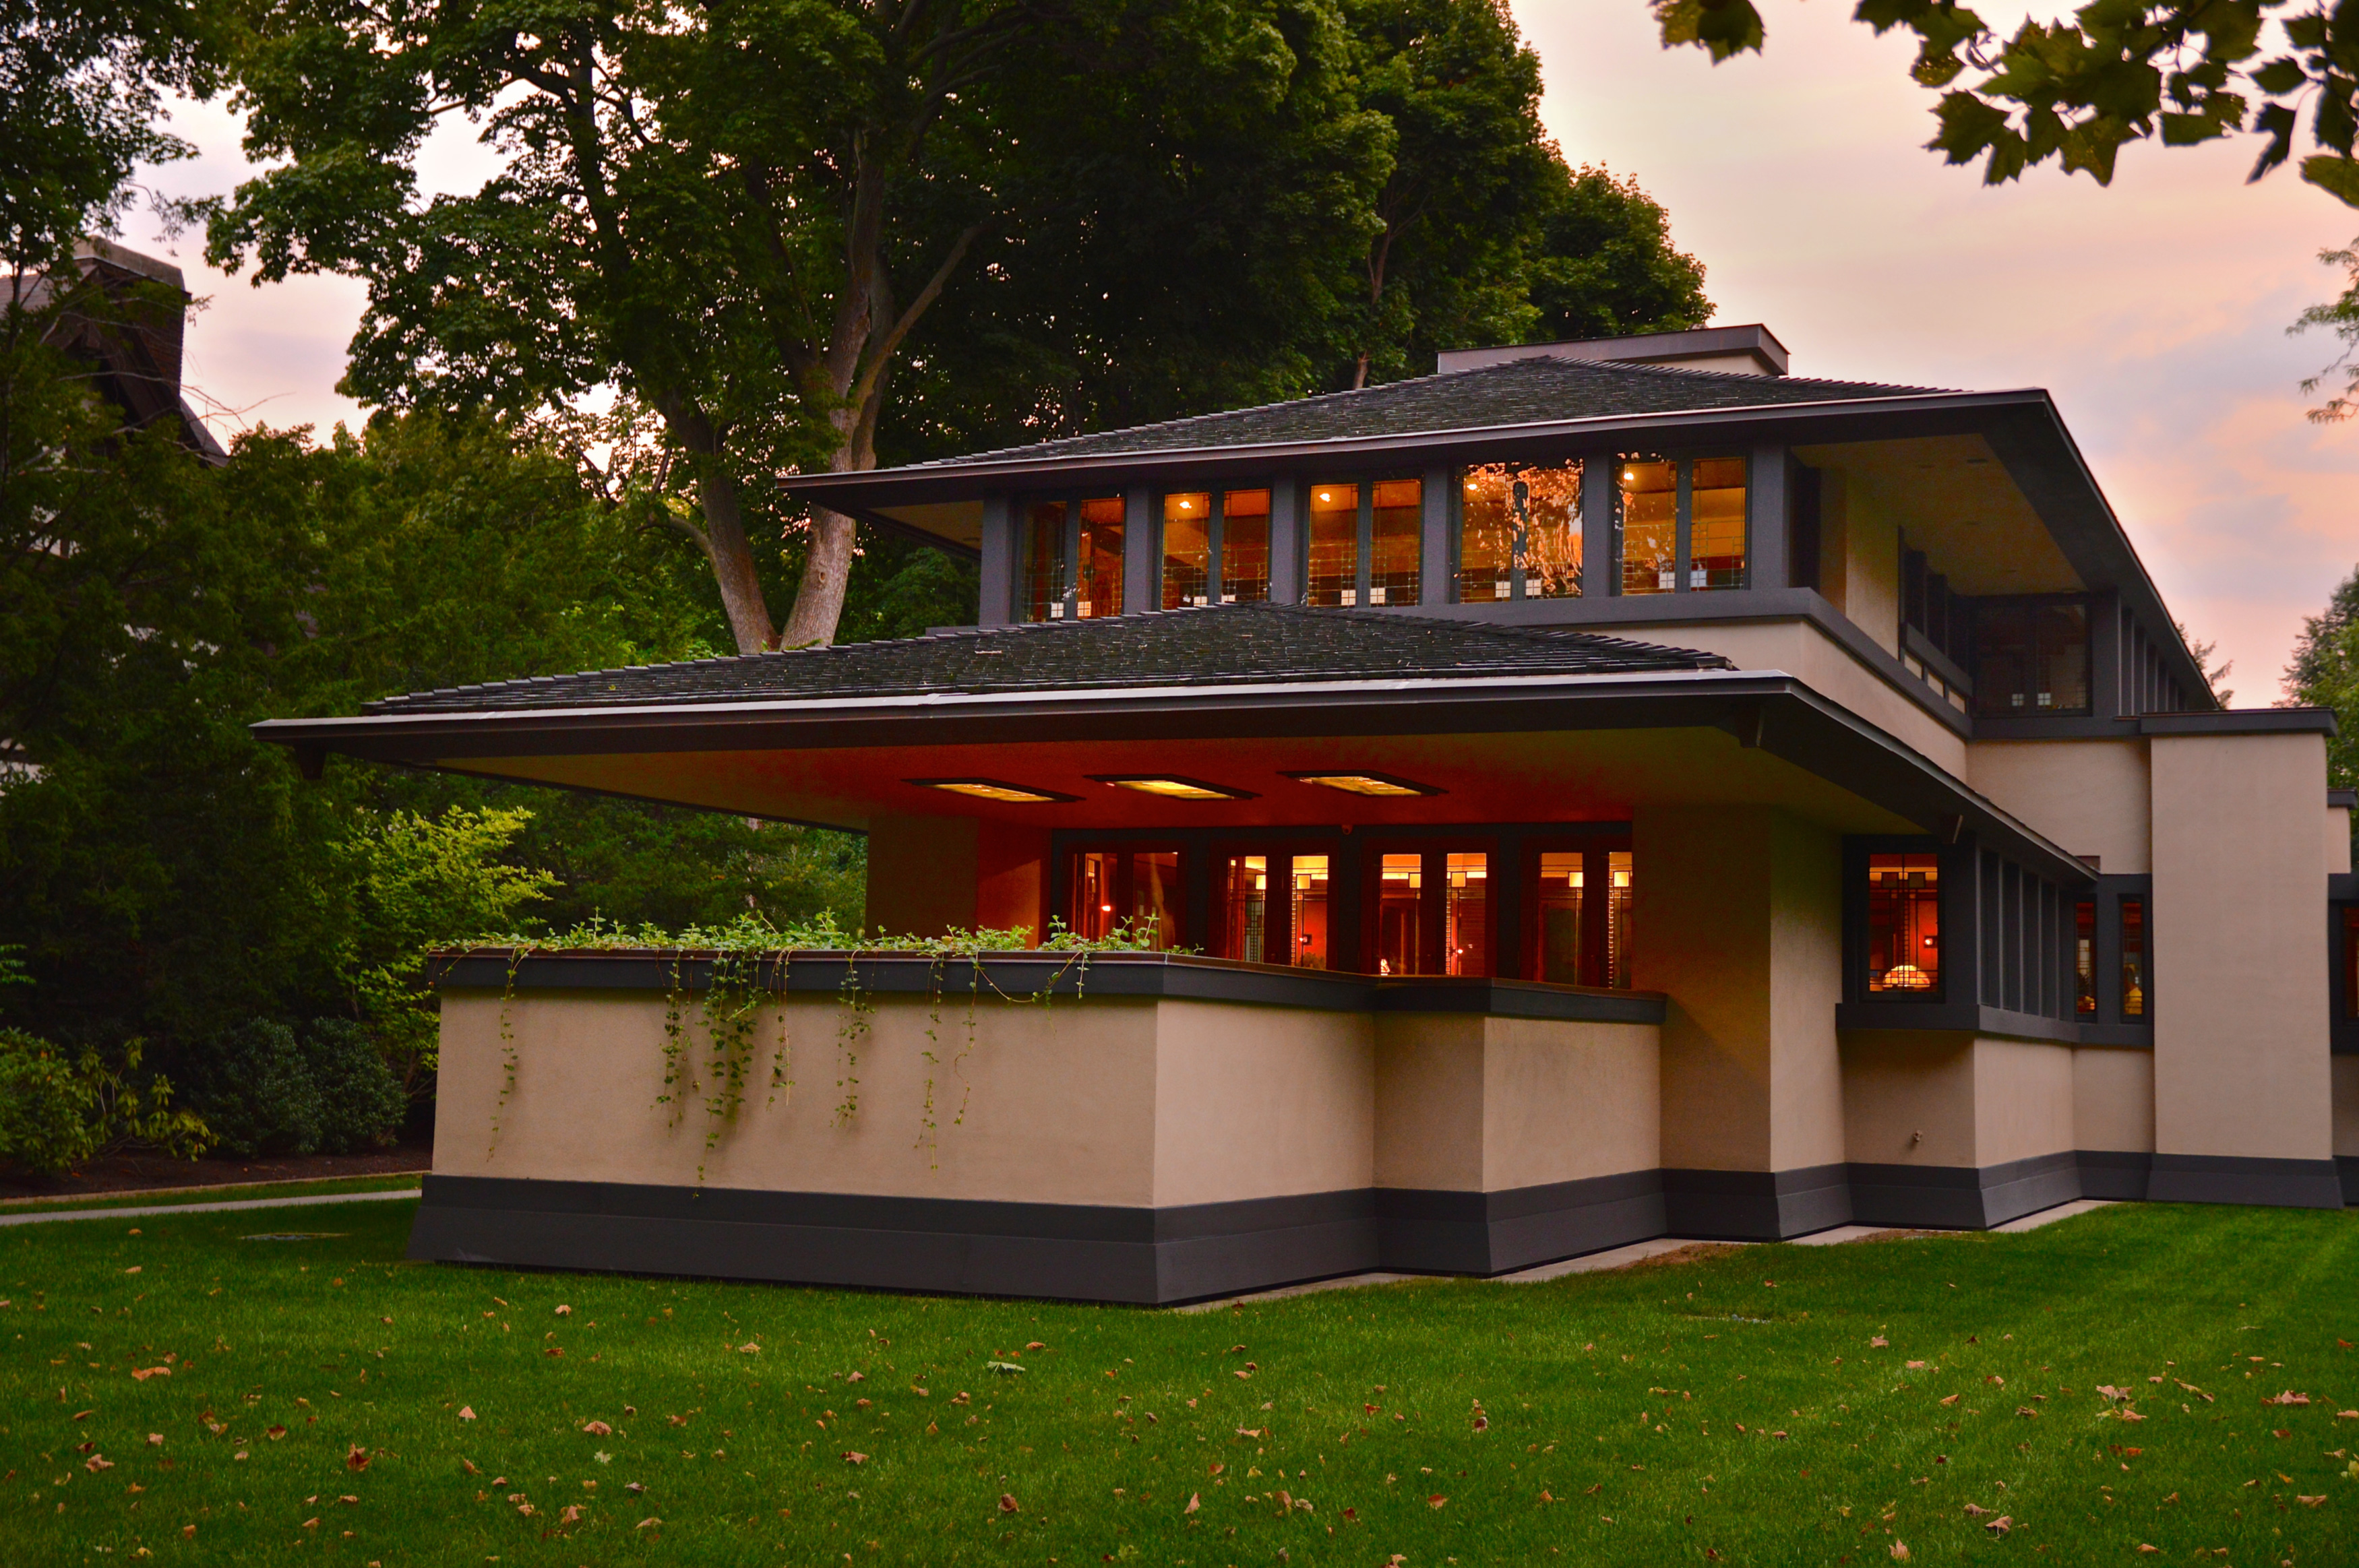 Talk: Rehabbing Frank Lloyd Wright's Boynton House 1